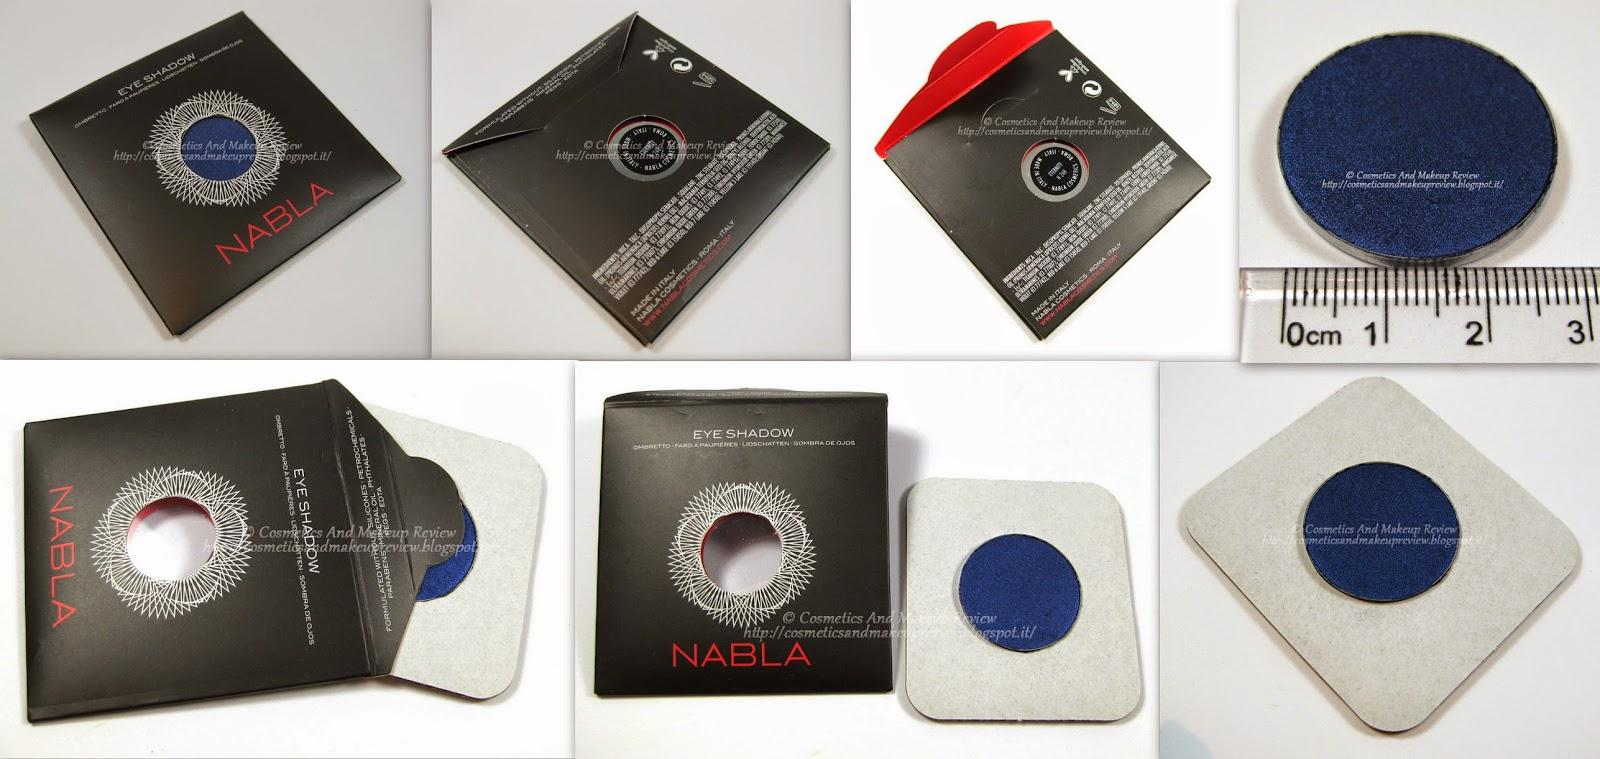 Nabla Cosmetics - Genesis Collection - packaging